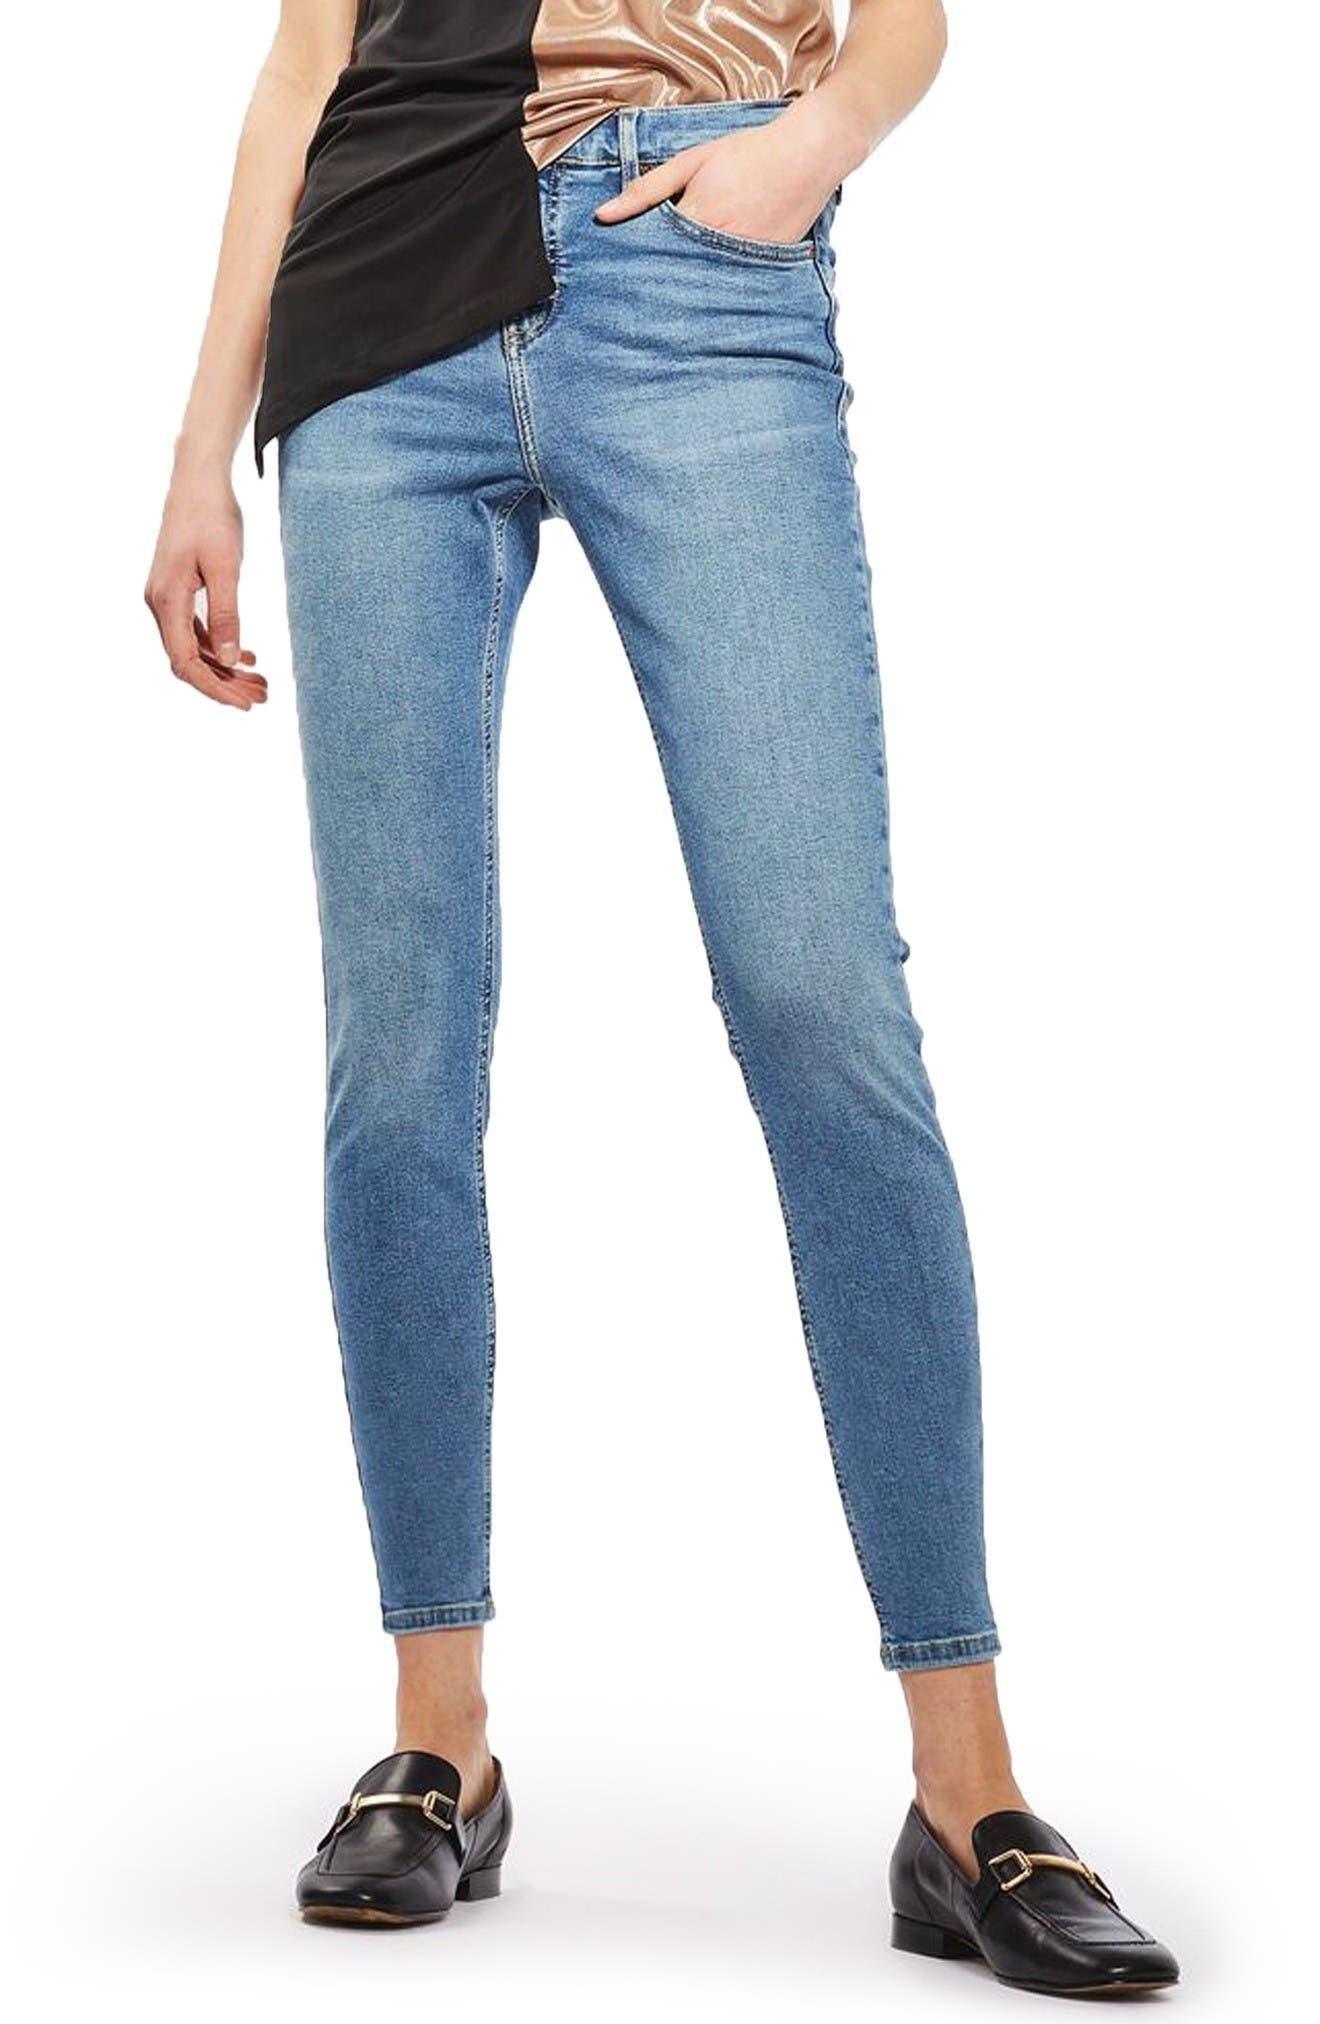 Alternate Image 1 Selected - Topshop Jamie High Waist Skinny Jeans (Petite)